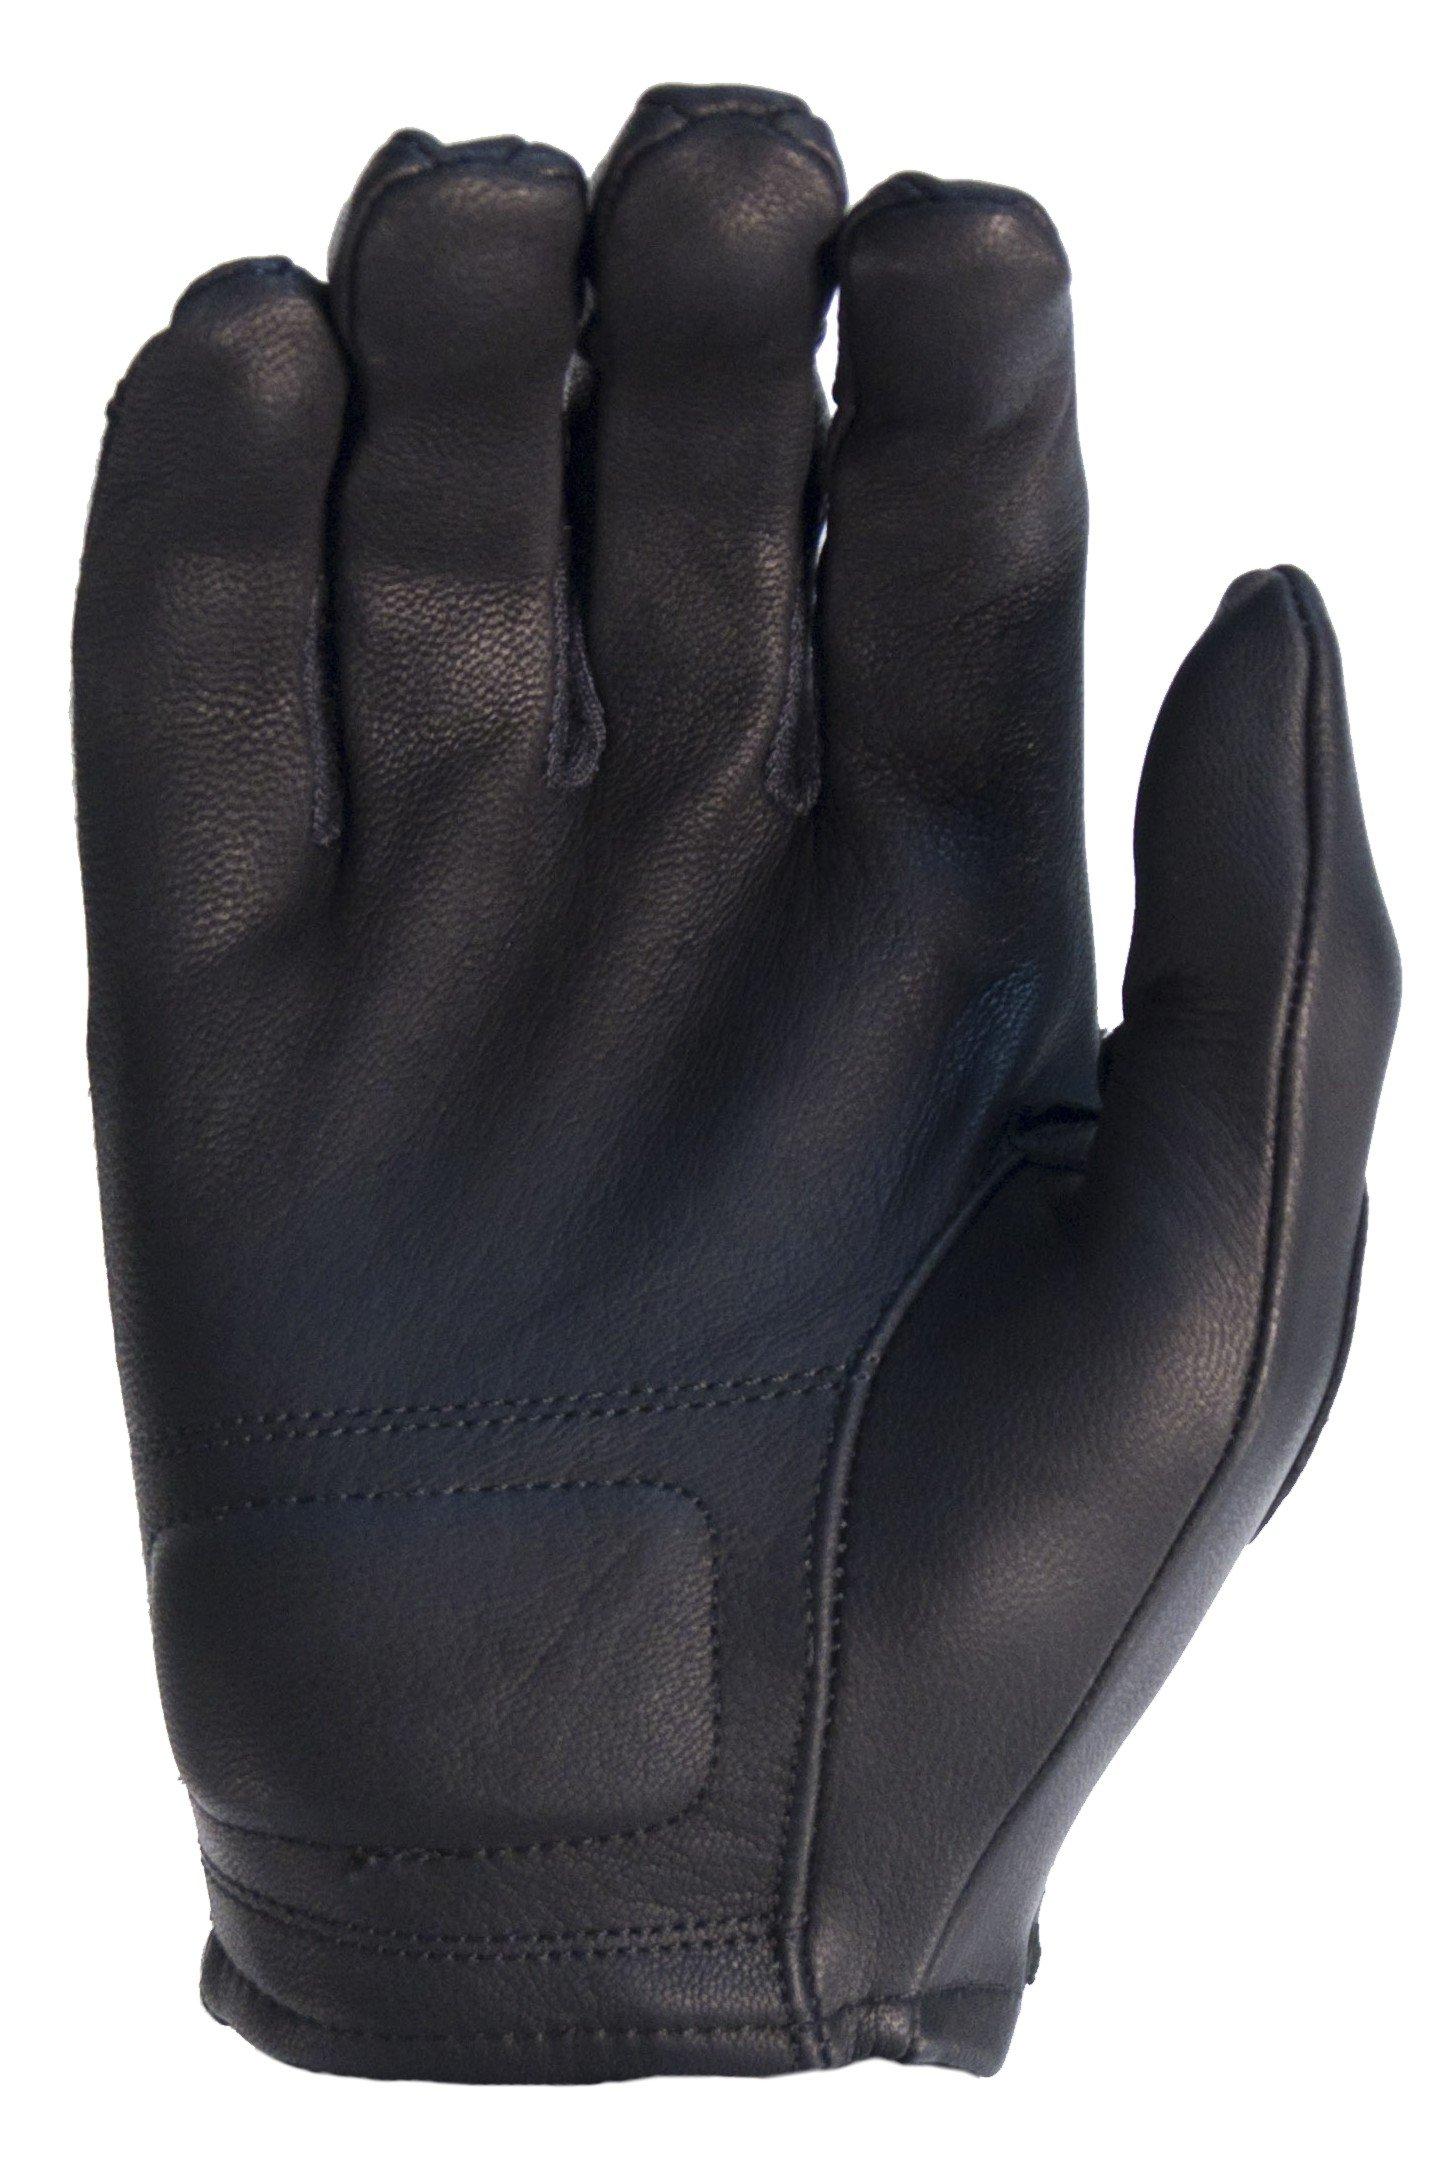 HWI Gear Combat Glove, Small, Black